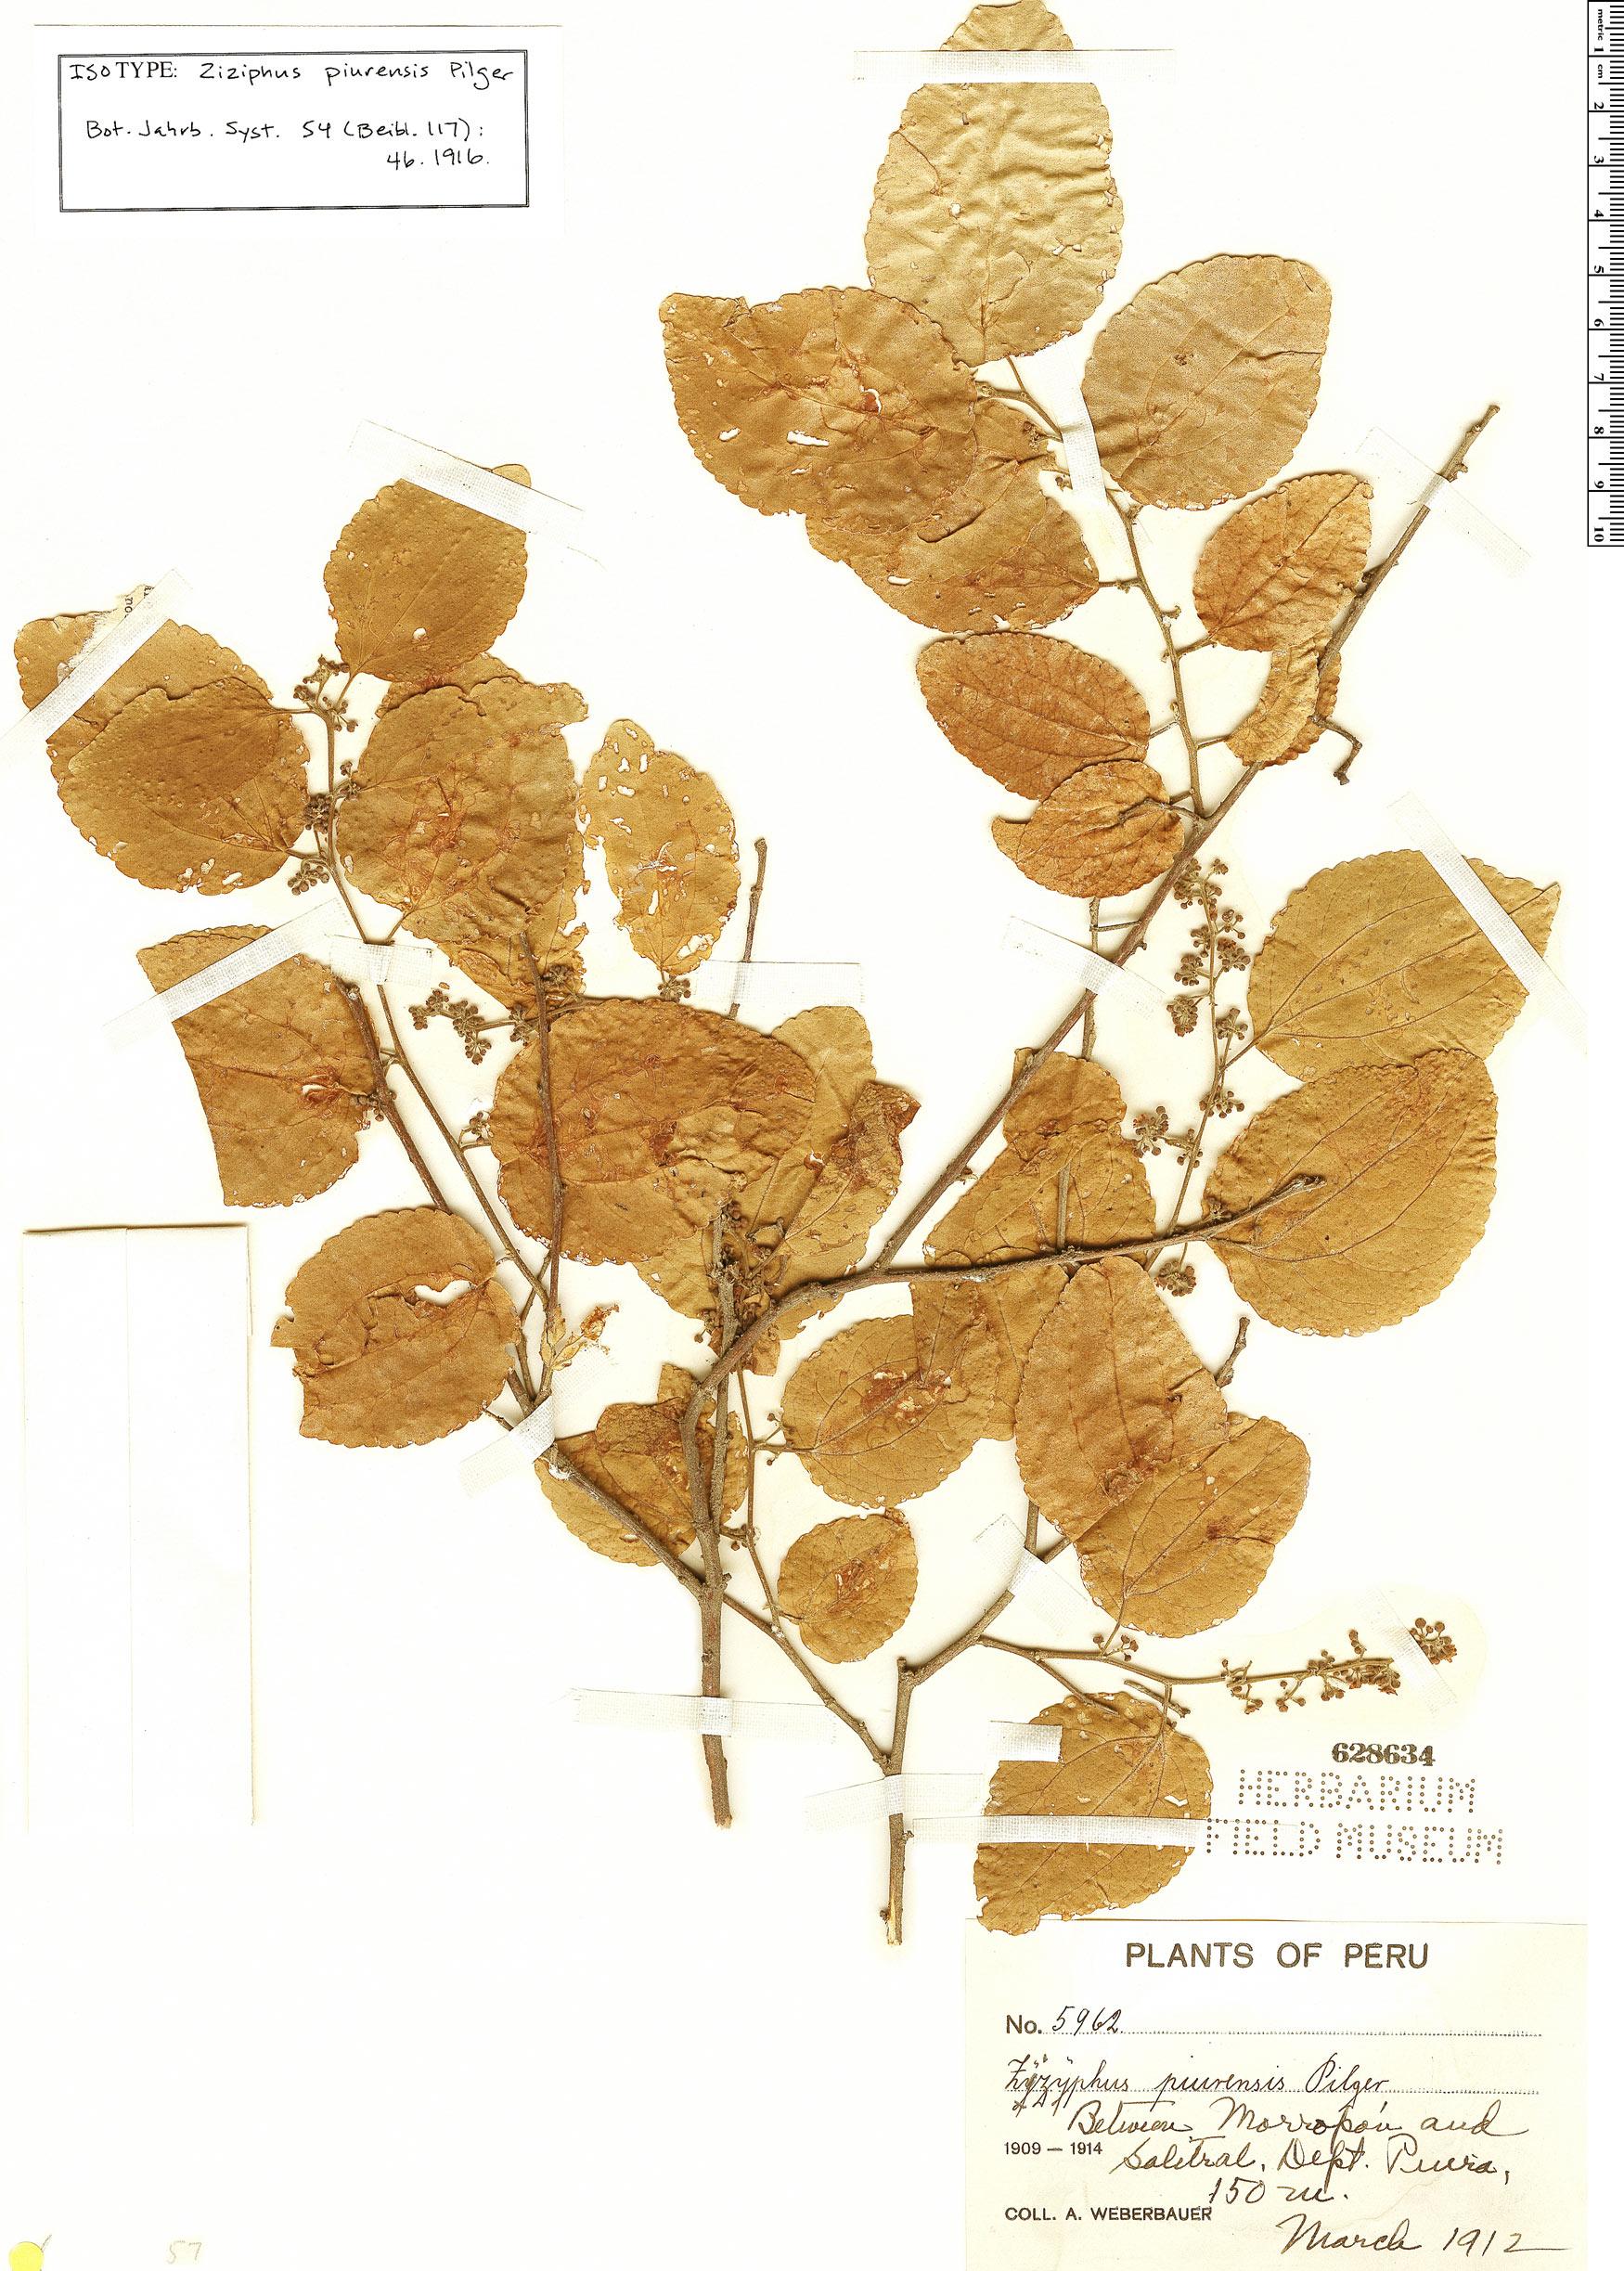 Specimen: Ziziphus piurensis